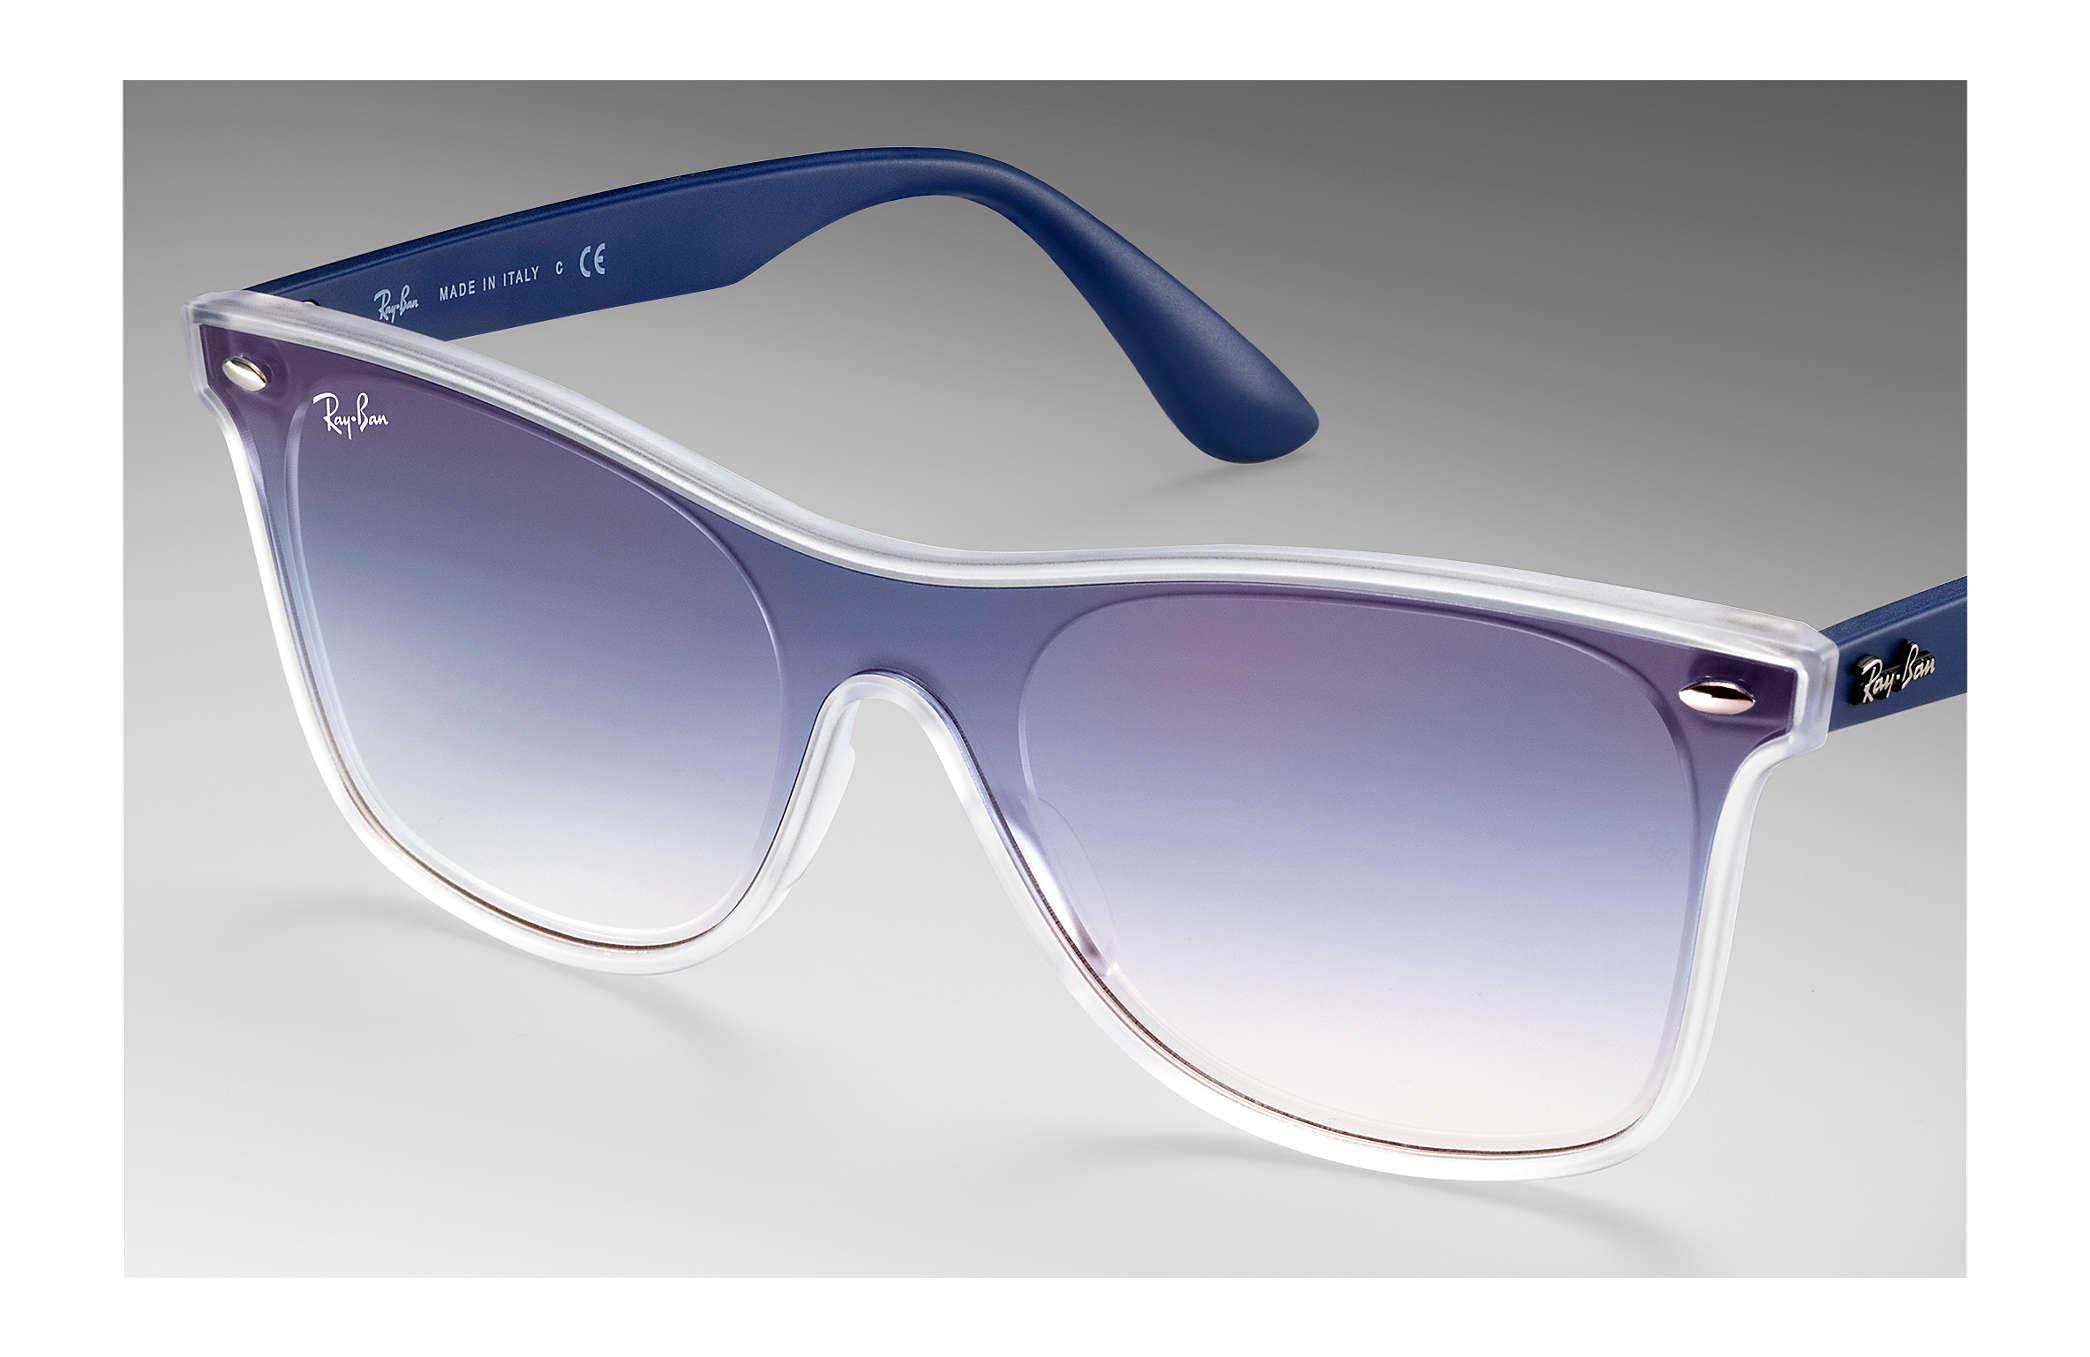 00a688c635 Ray-Ban Blaze Wayfarer RB4440NF Transparent - Nylon - Blue Lenses ...